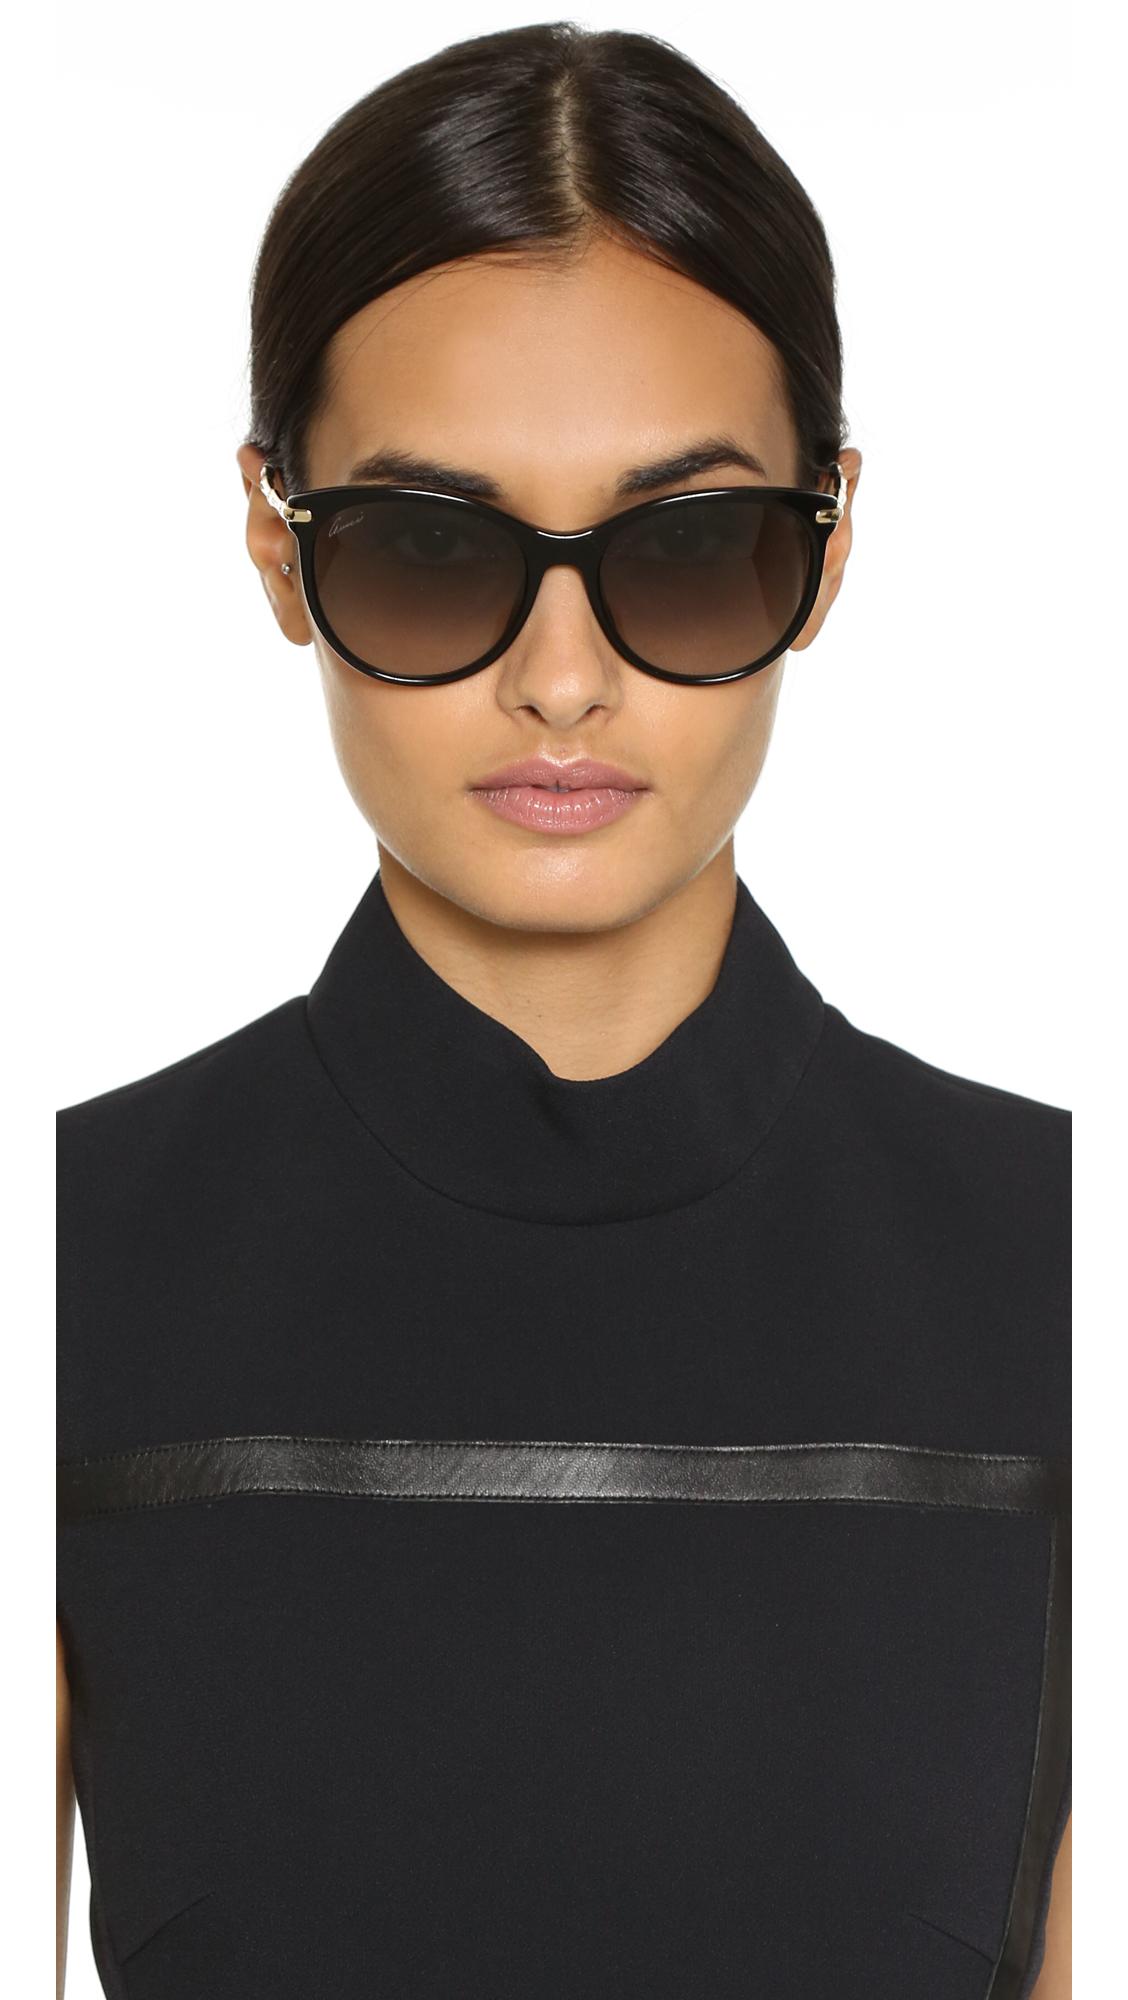 56c8ed7b613 Lyst - Gucci Bamboo Temple Sunglasses in Black